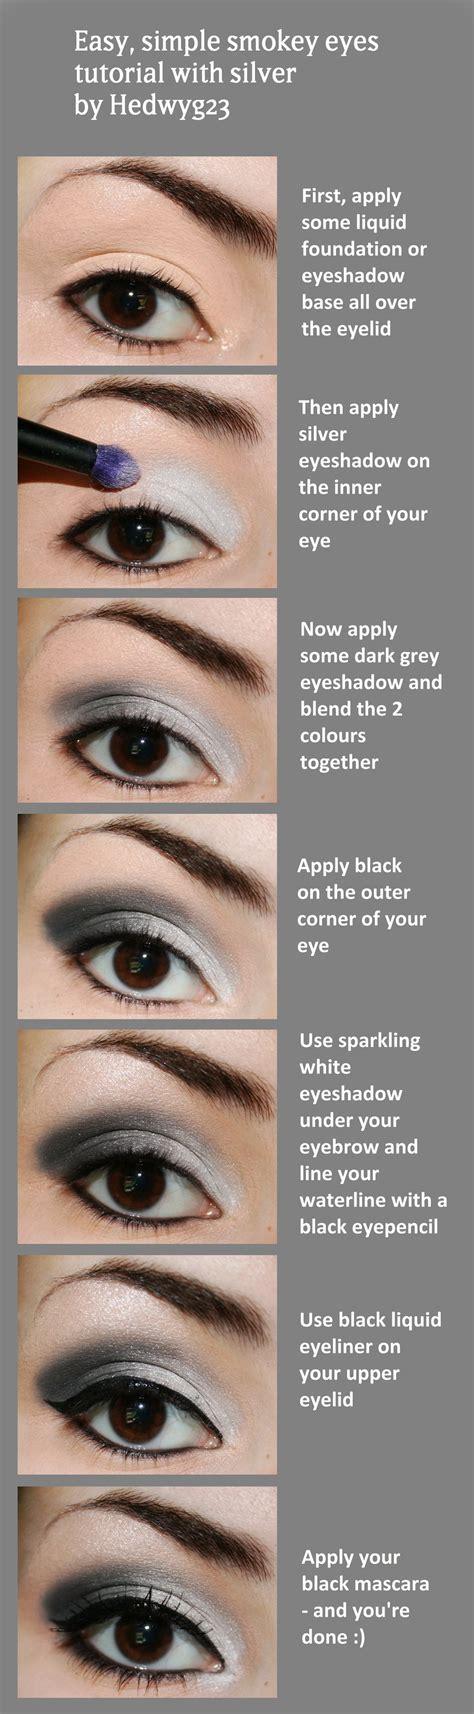 tutorial makeup smokey eyes silver smokey eye make up tutorial cosplay blog with a